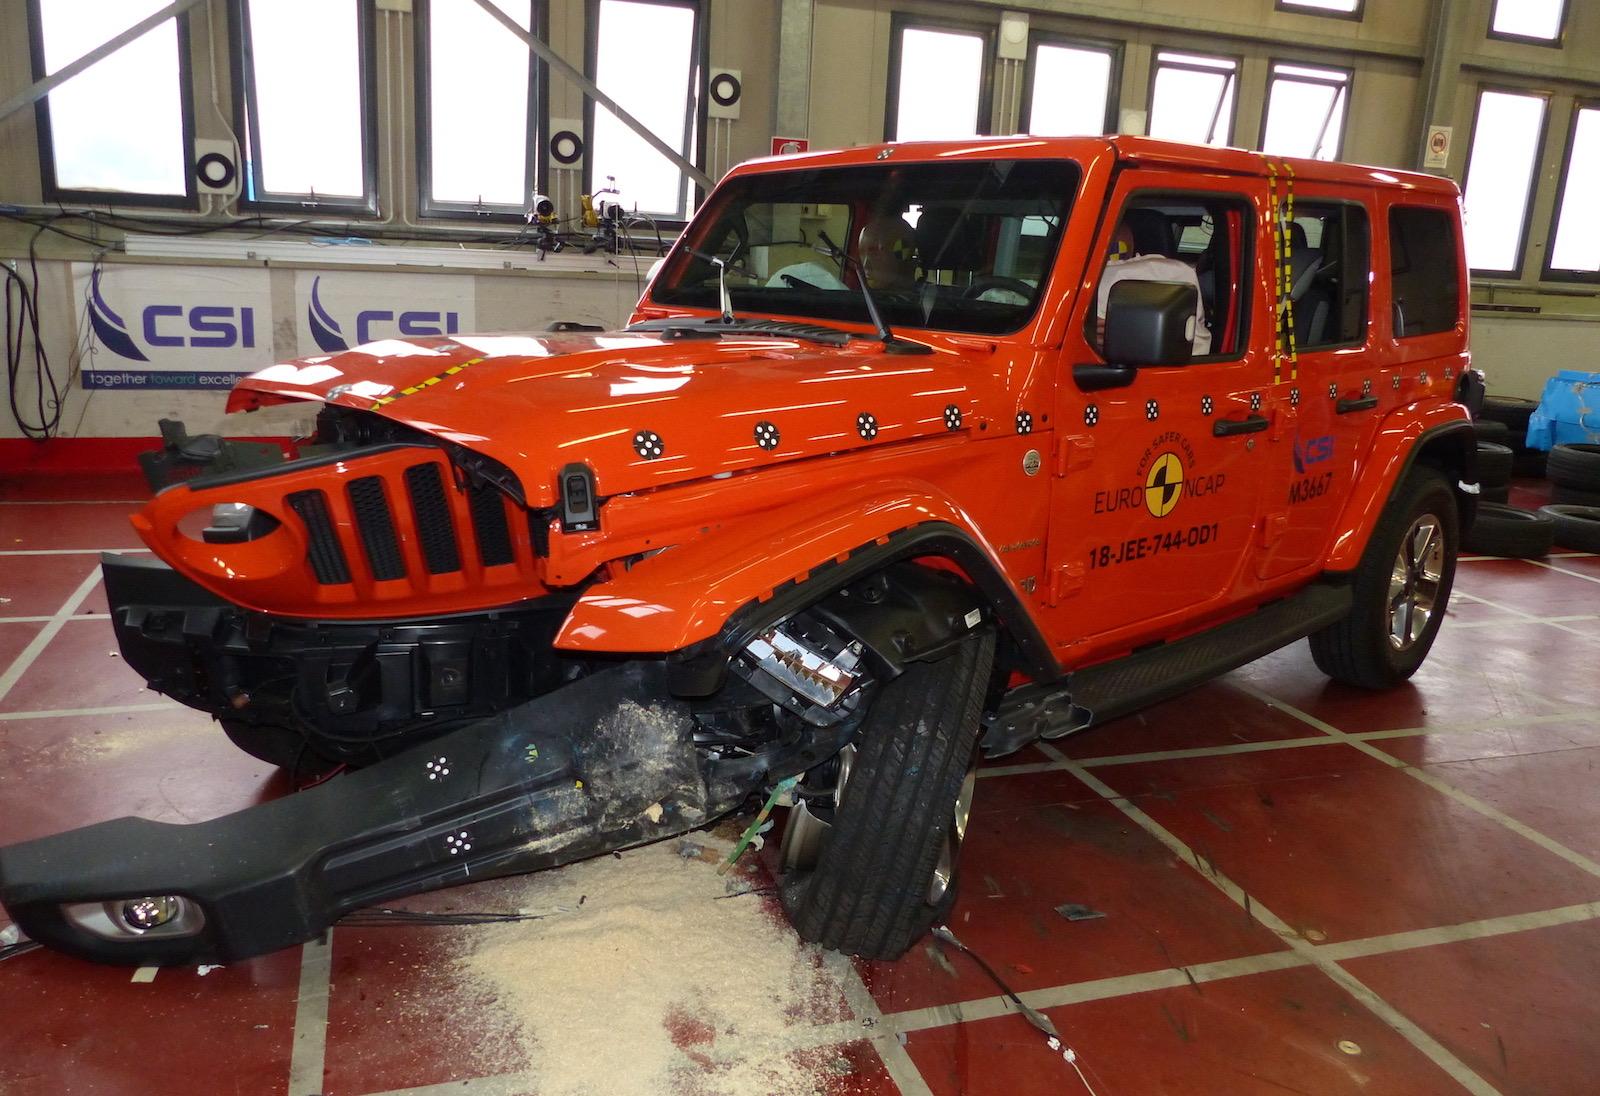 New Jeep Wrangler Scores 1 Star In Euro NCAP Crash Tests